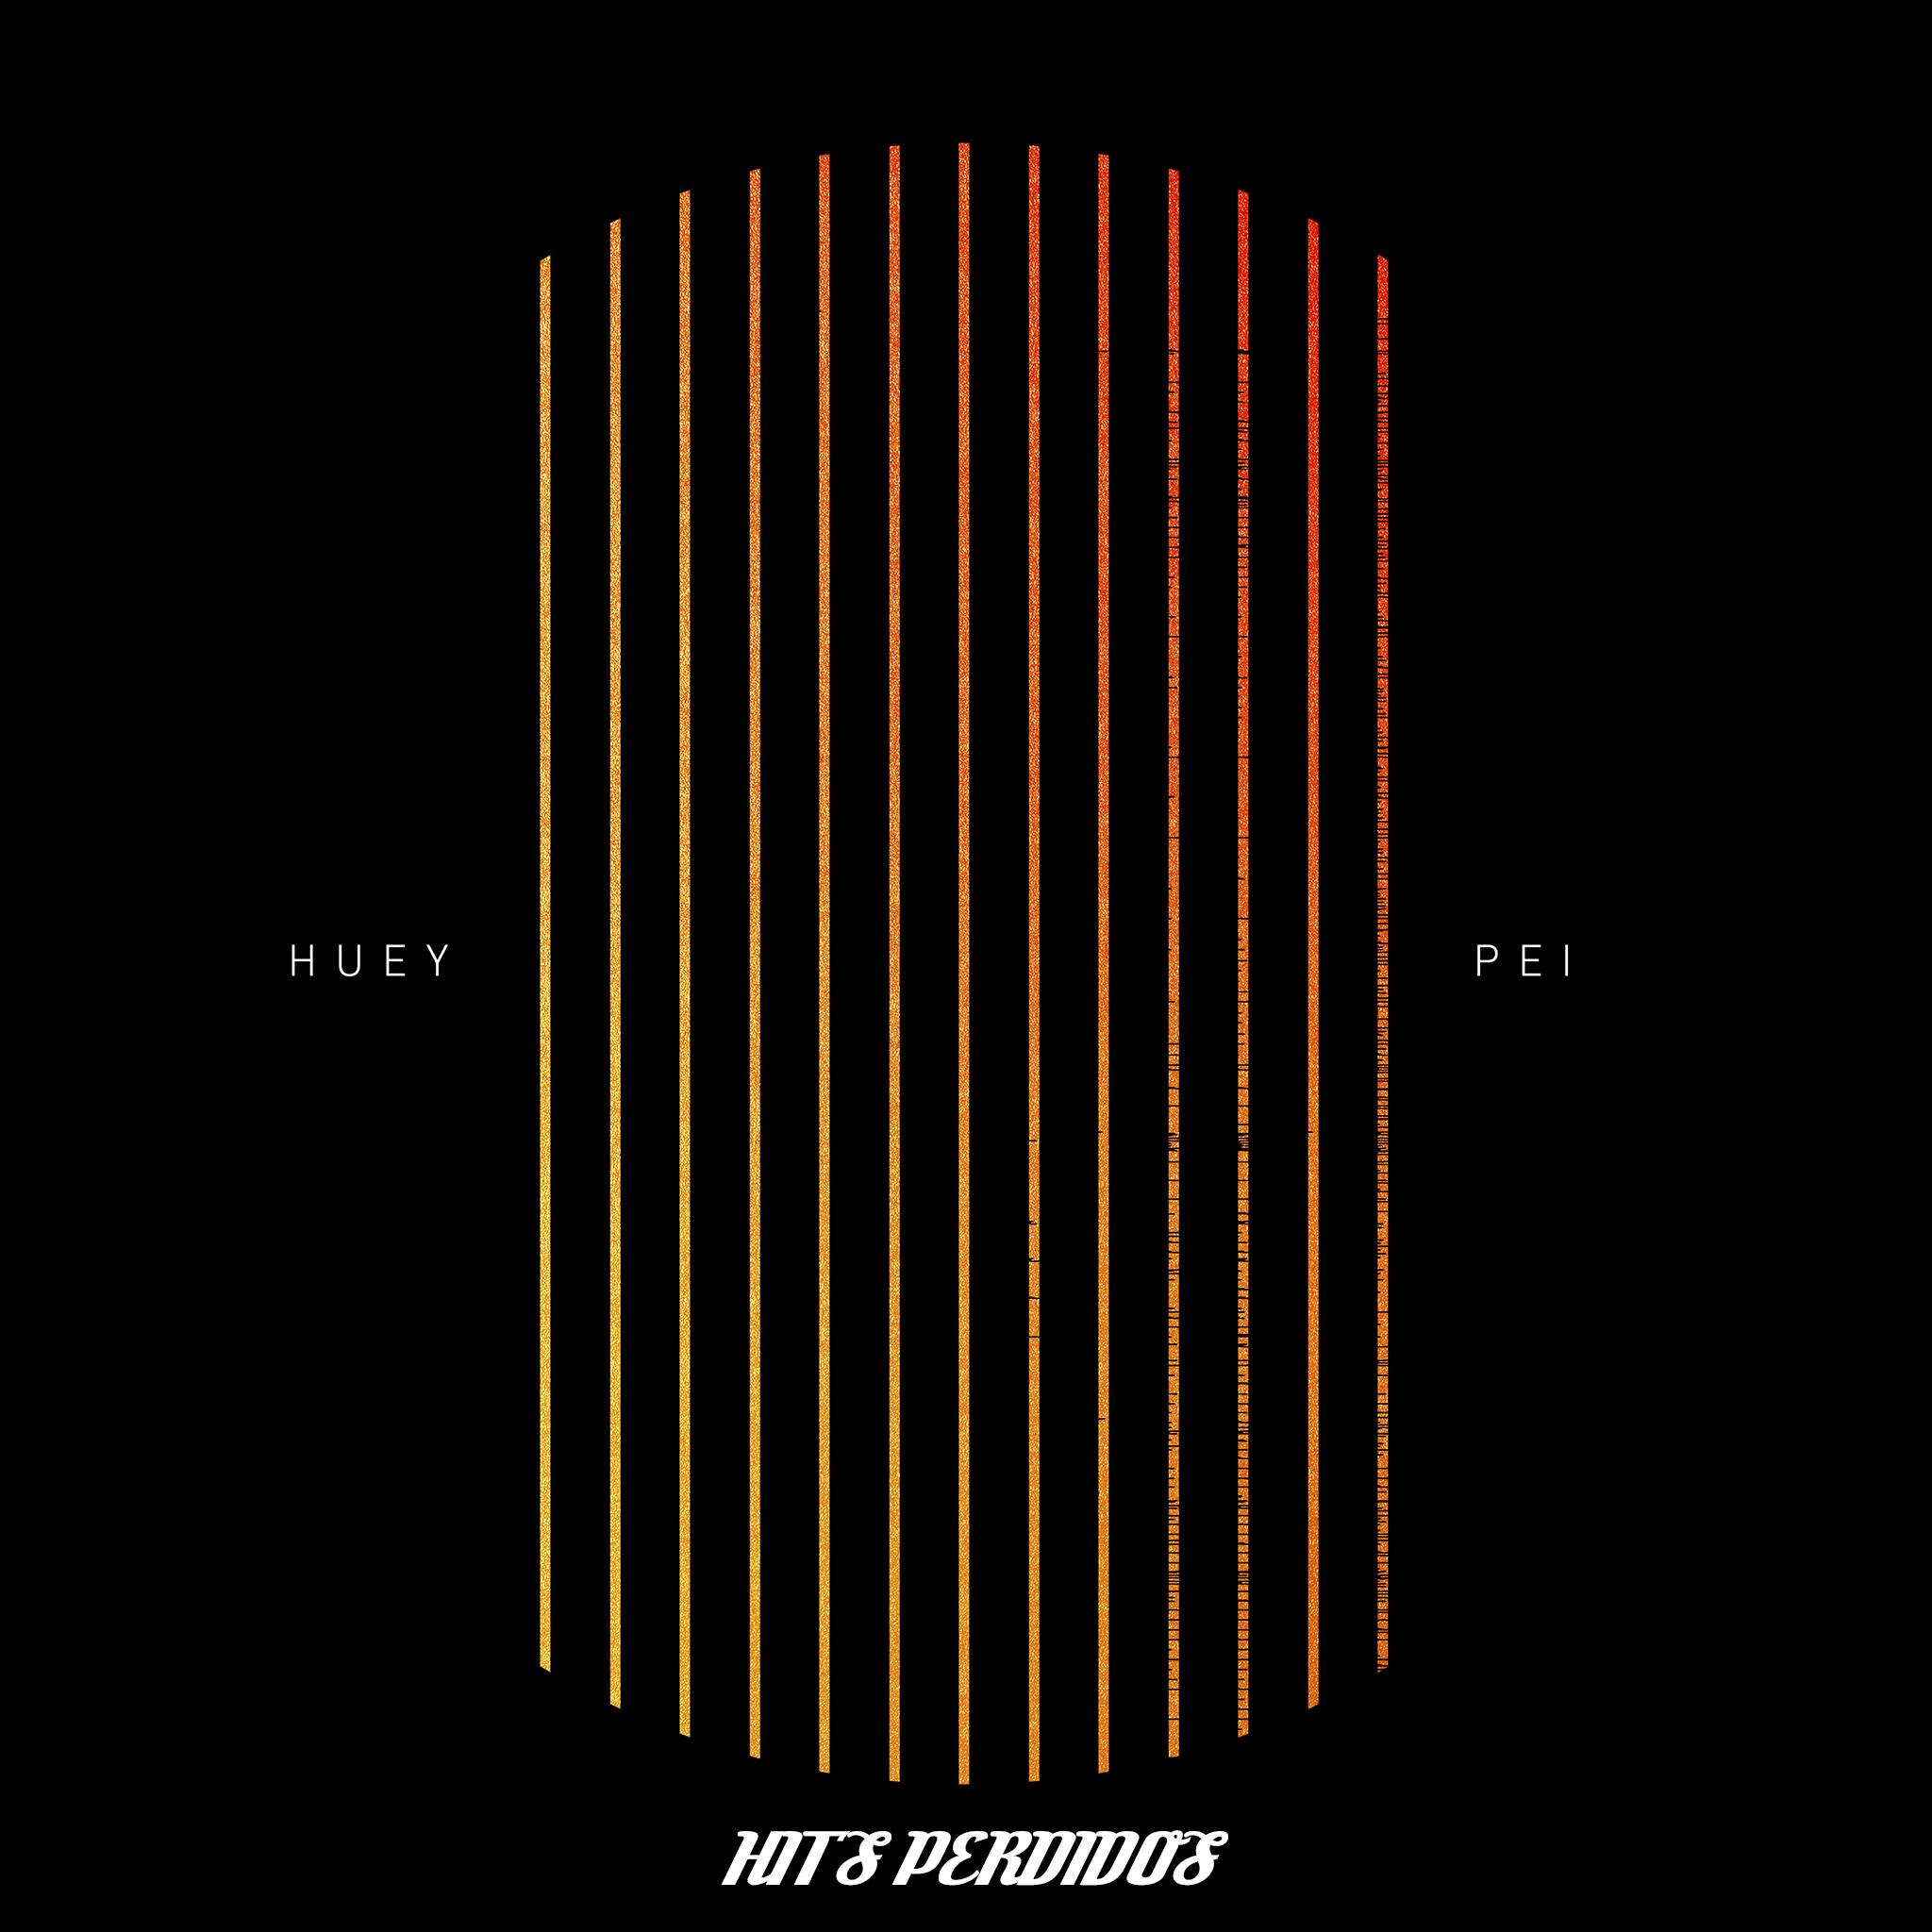 Playlist Huey